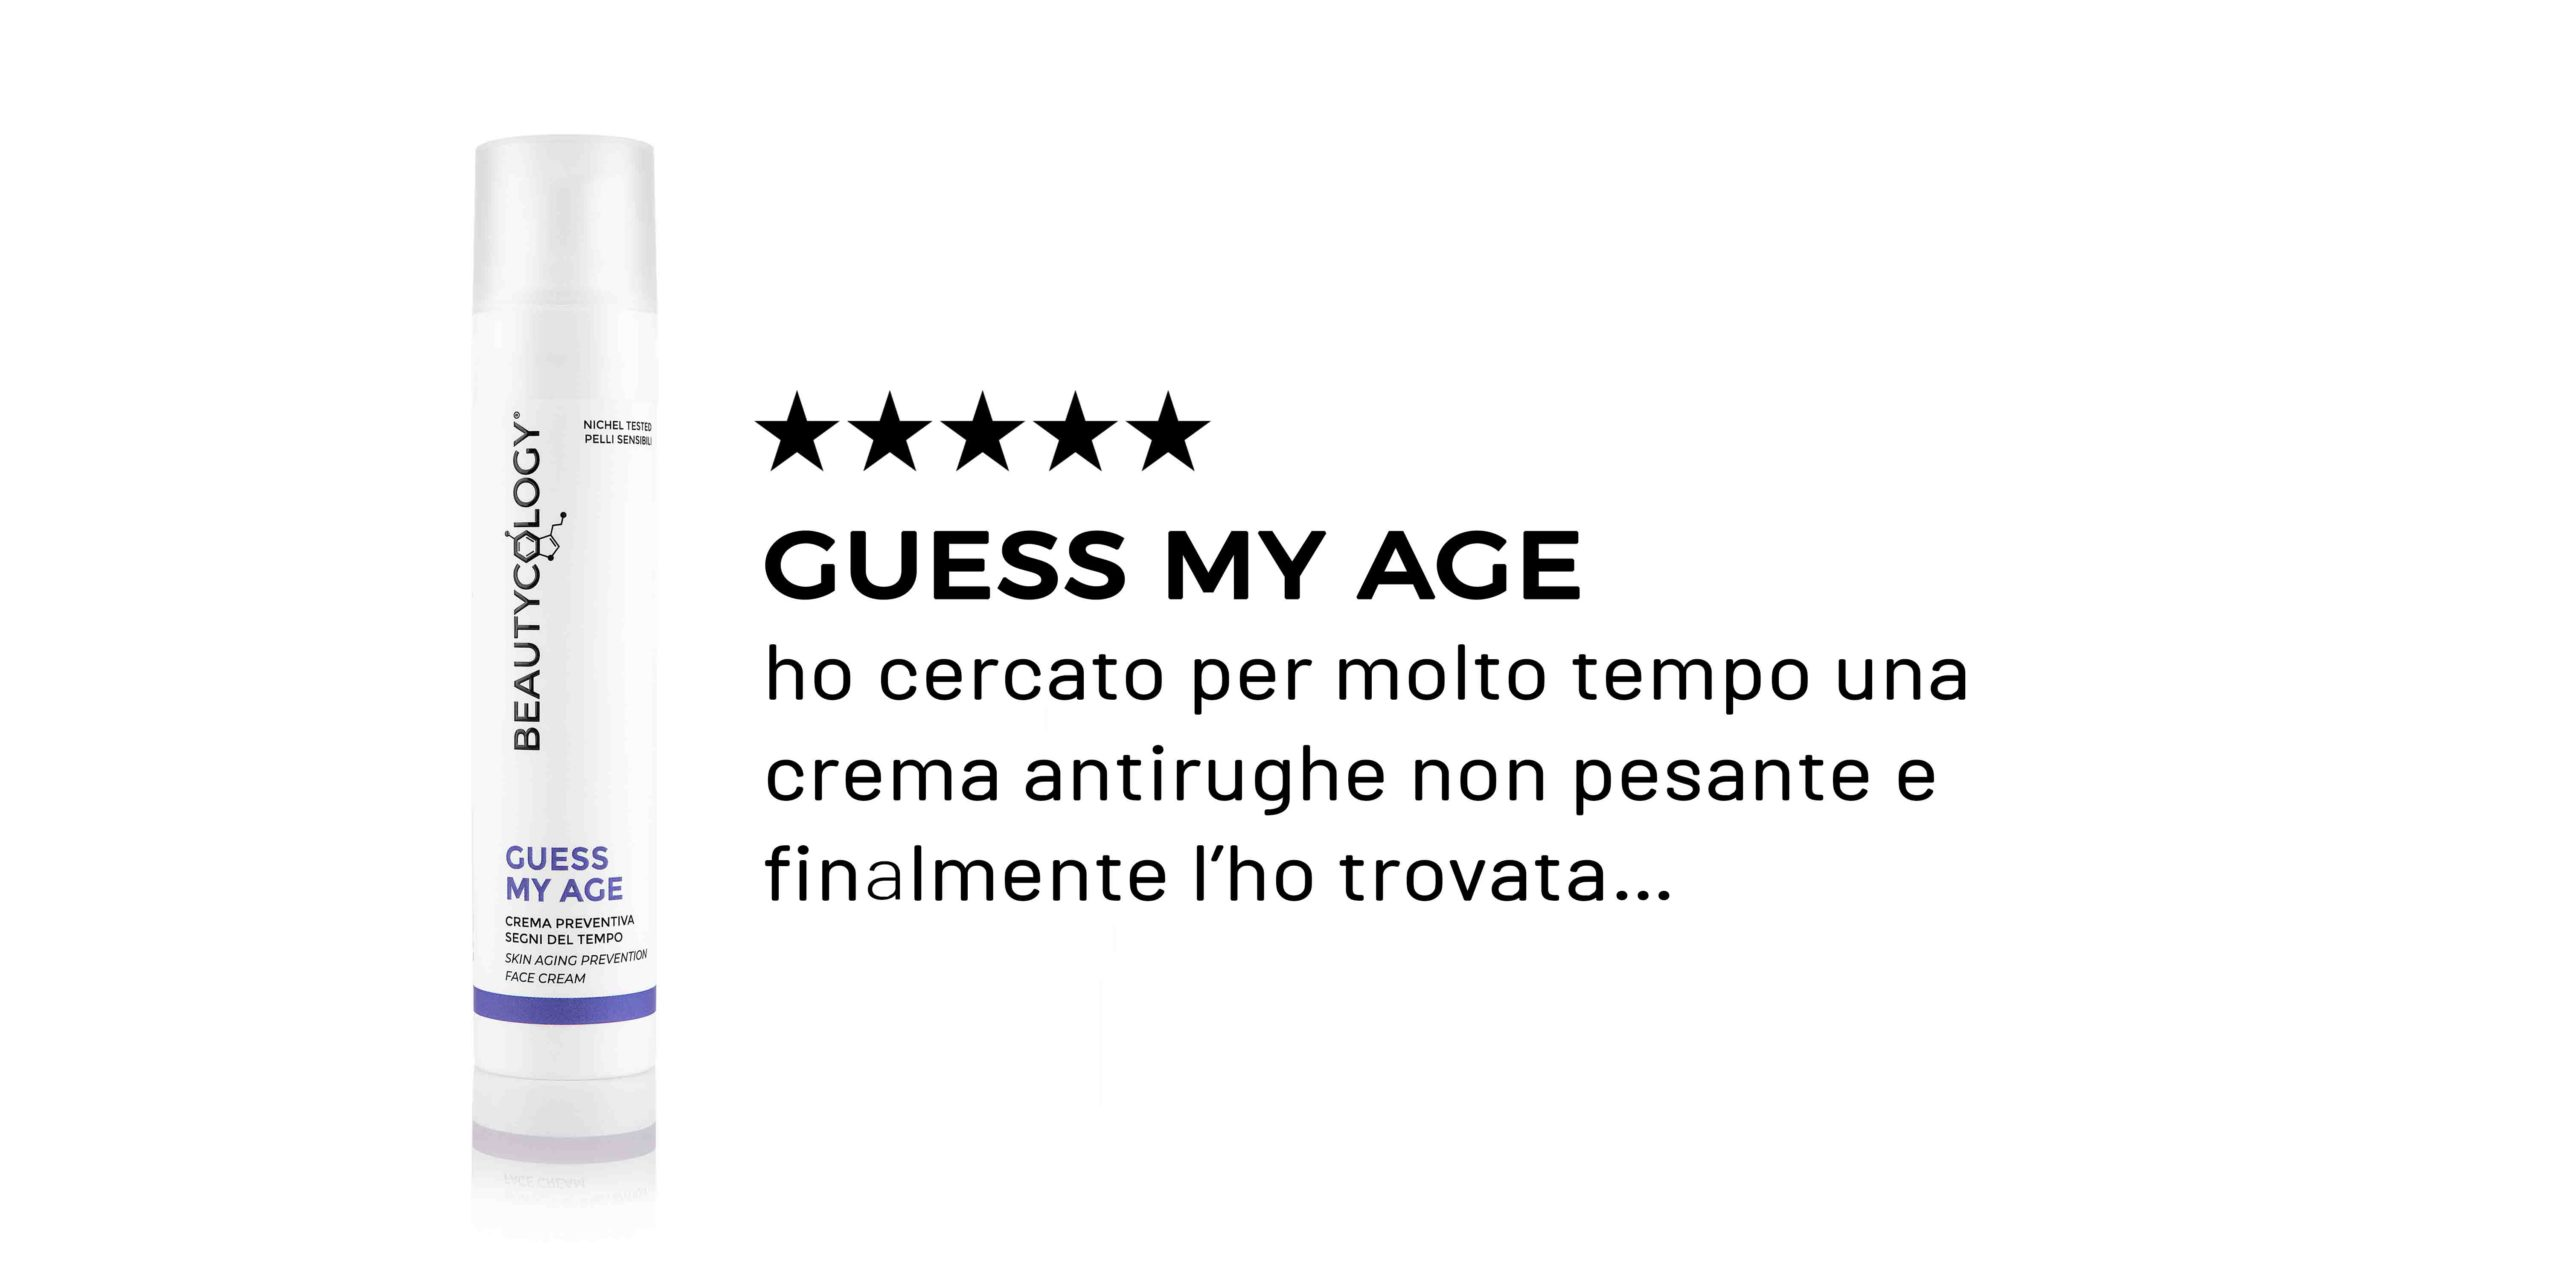 beautycologa crema antiage